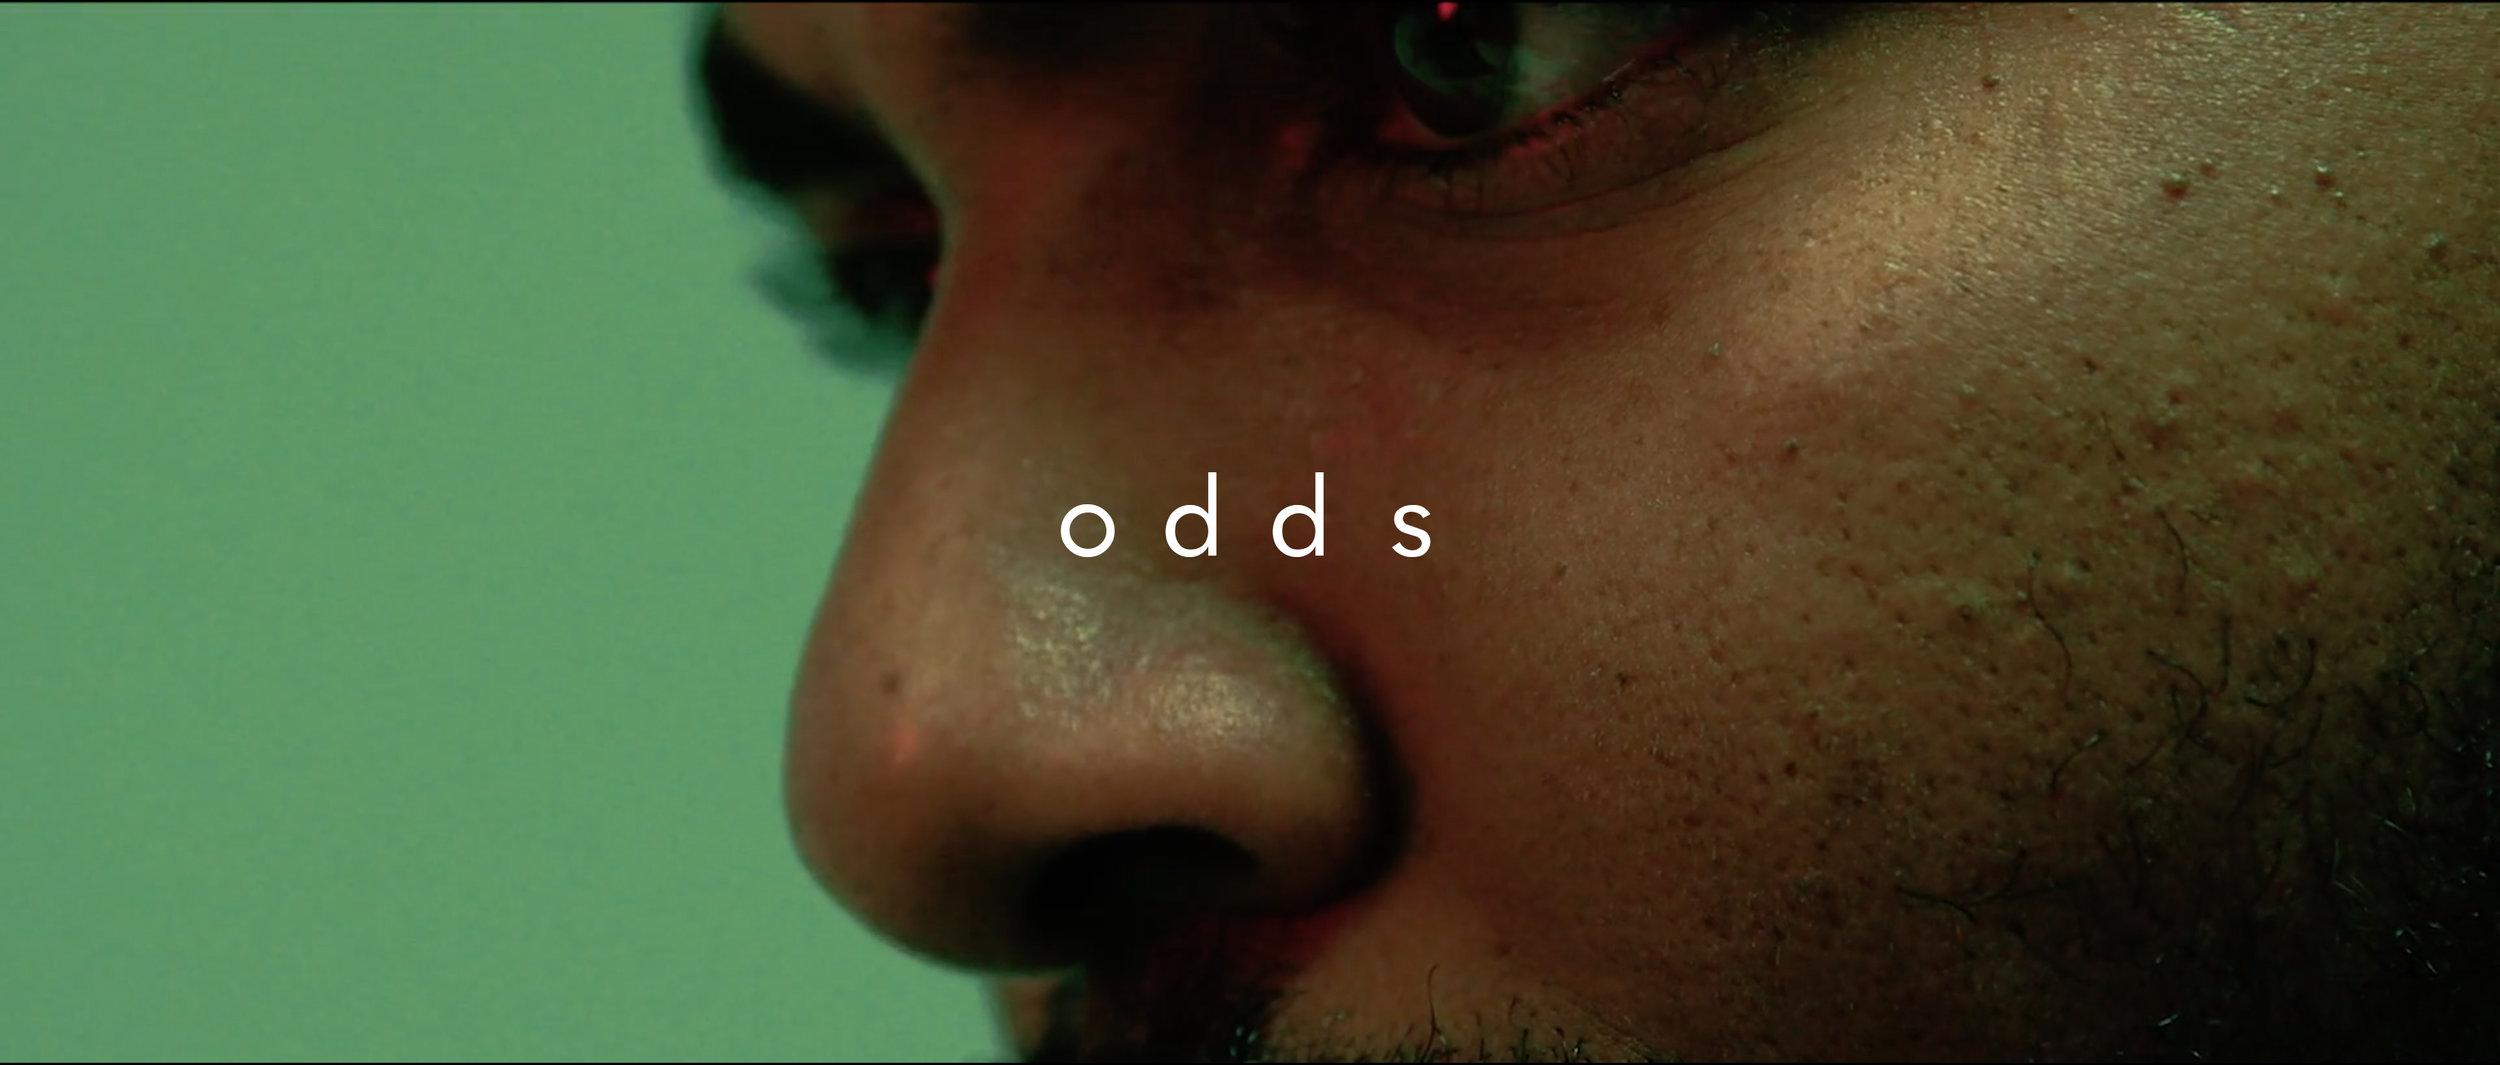 - ODDS (2016)Dir. Sherine ToussaintCo-Producer, Cinematographer, Editor, Colorist, VFX